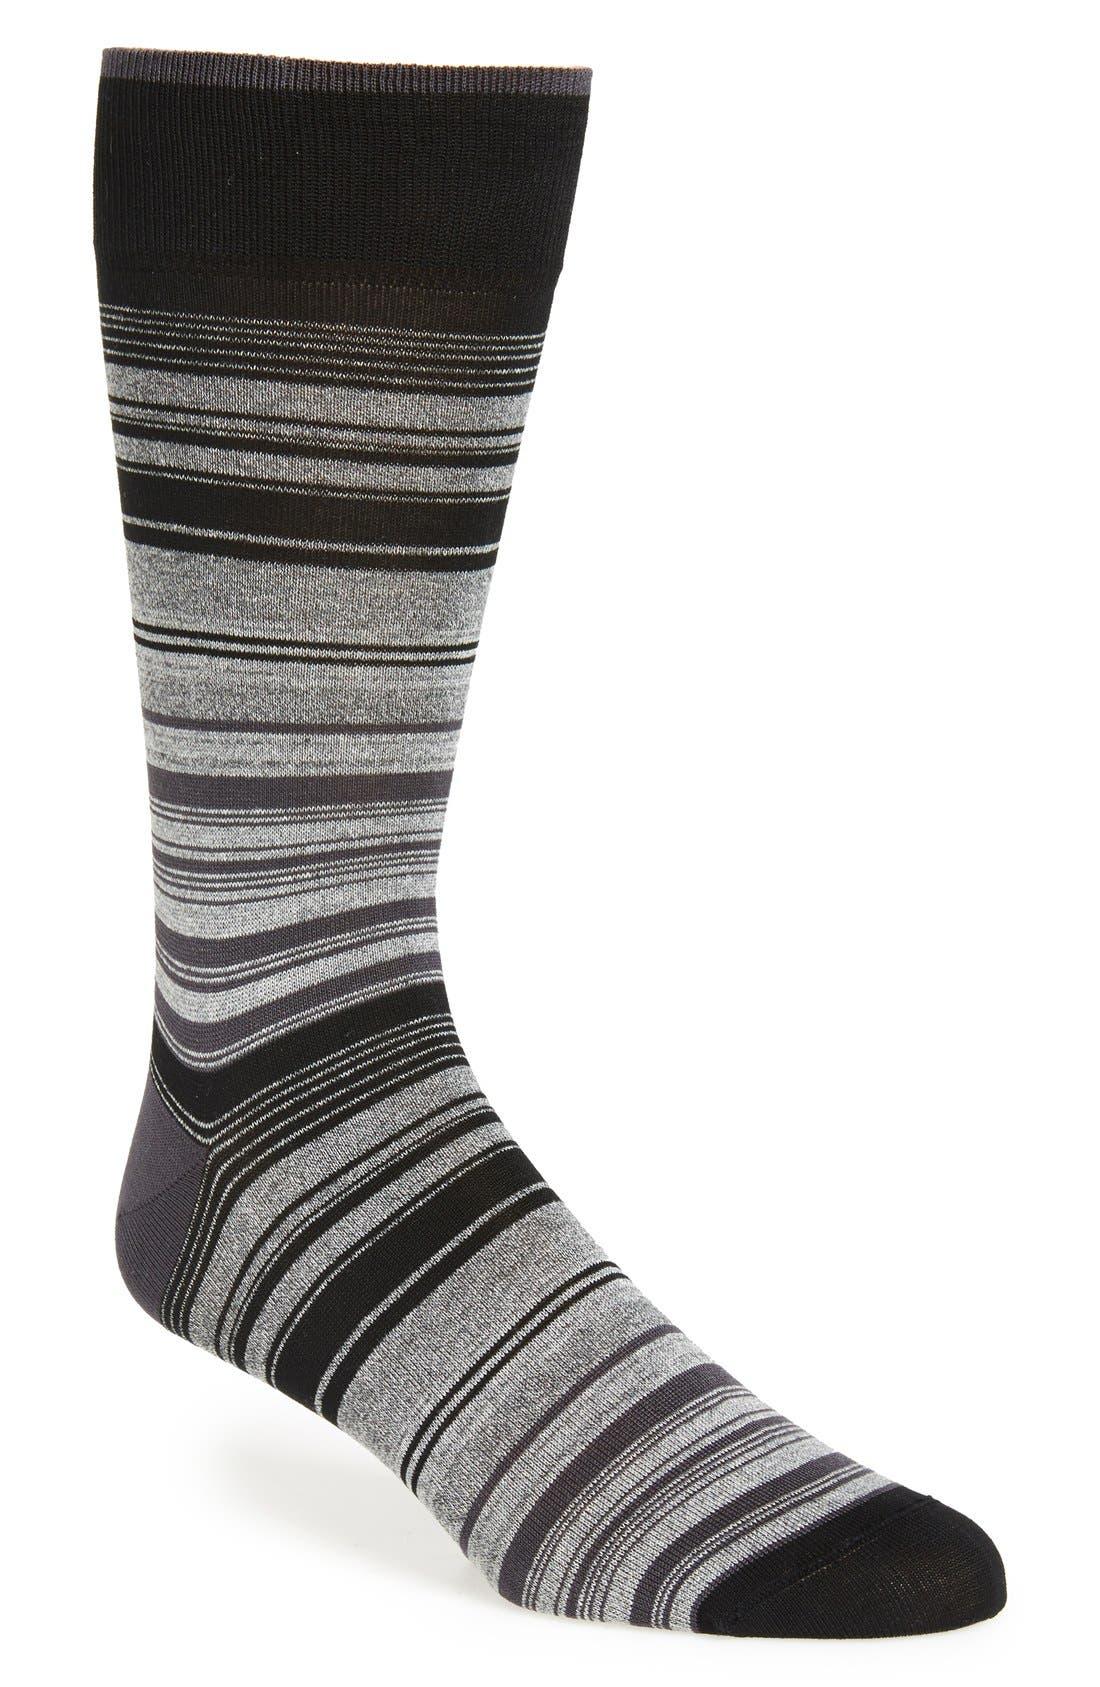 Mercerized Cotton Blend Socks,                         Main,                         color, 001